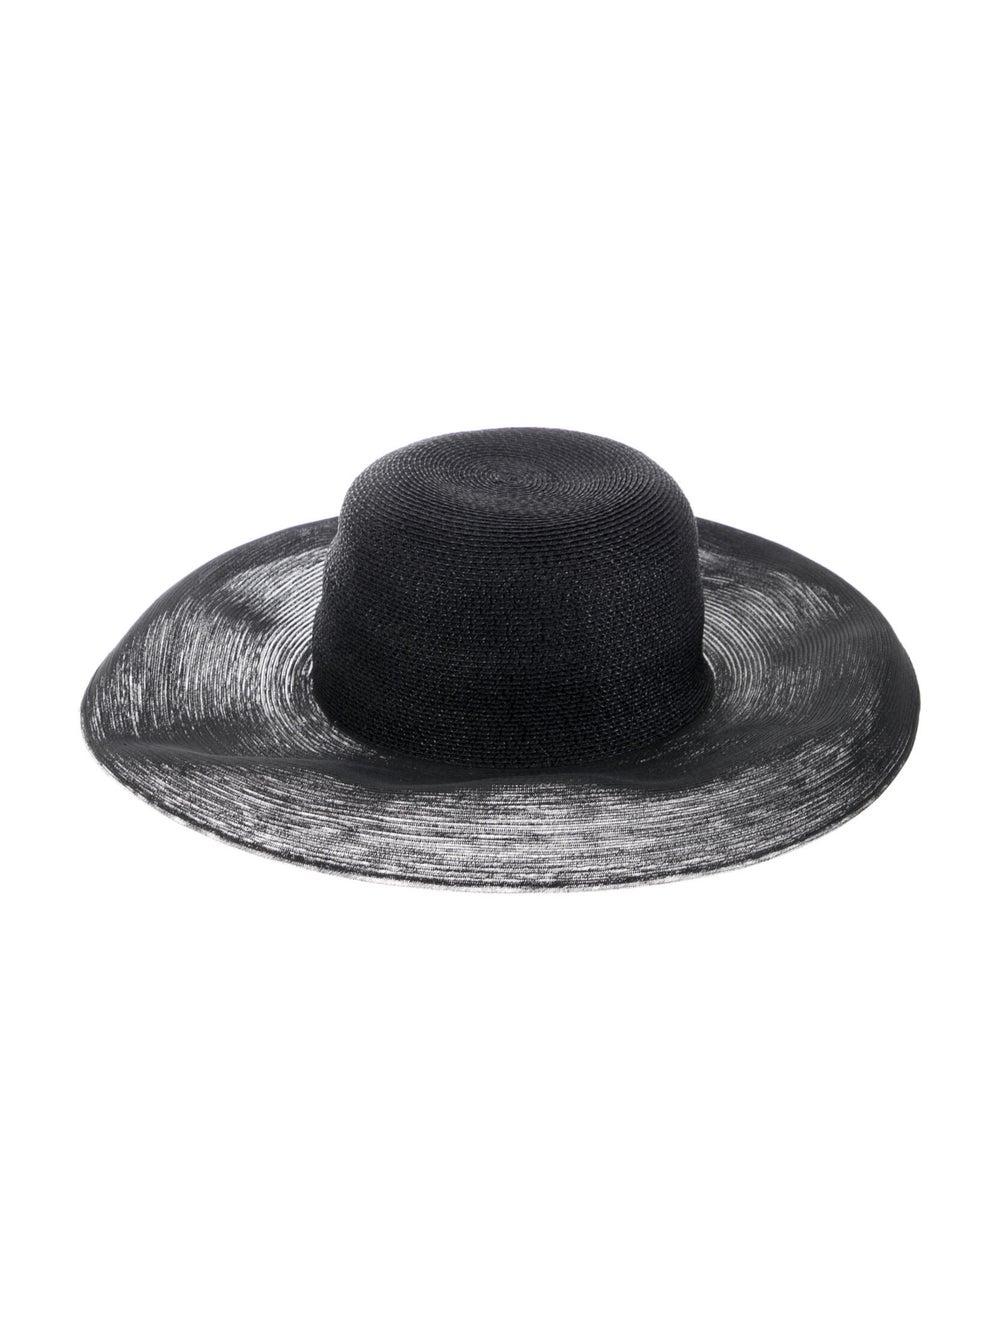 Patricia Underwood Wide Brim Hat Black - image 2